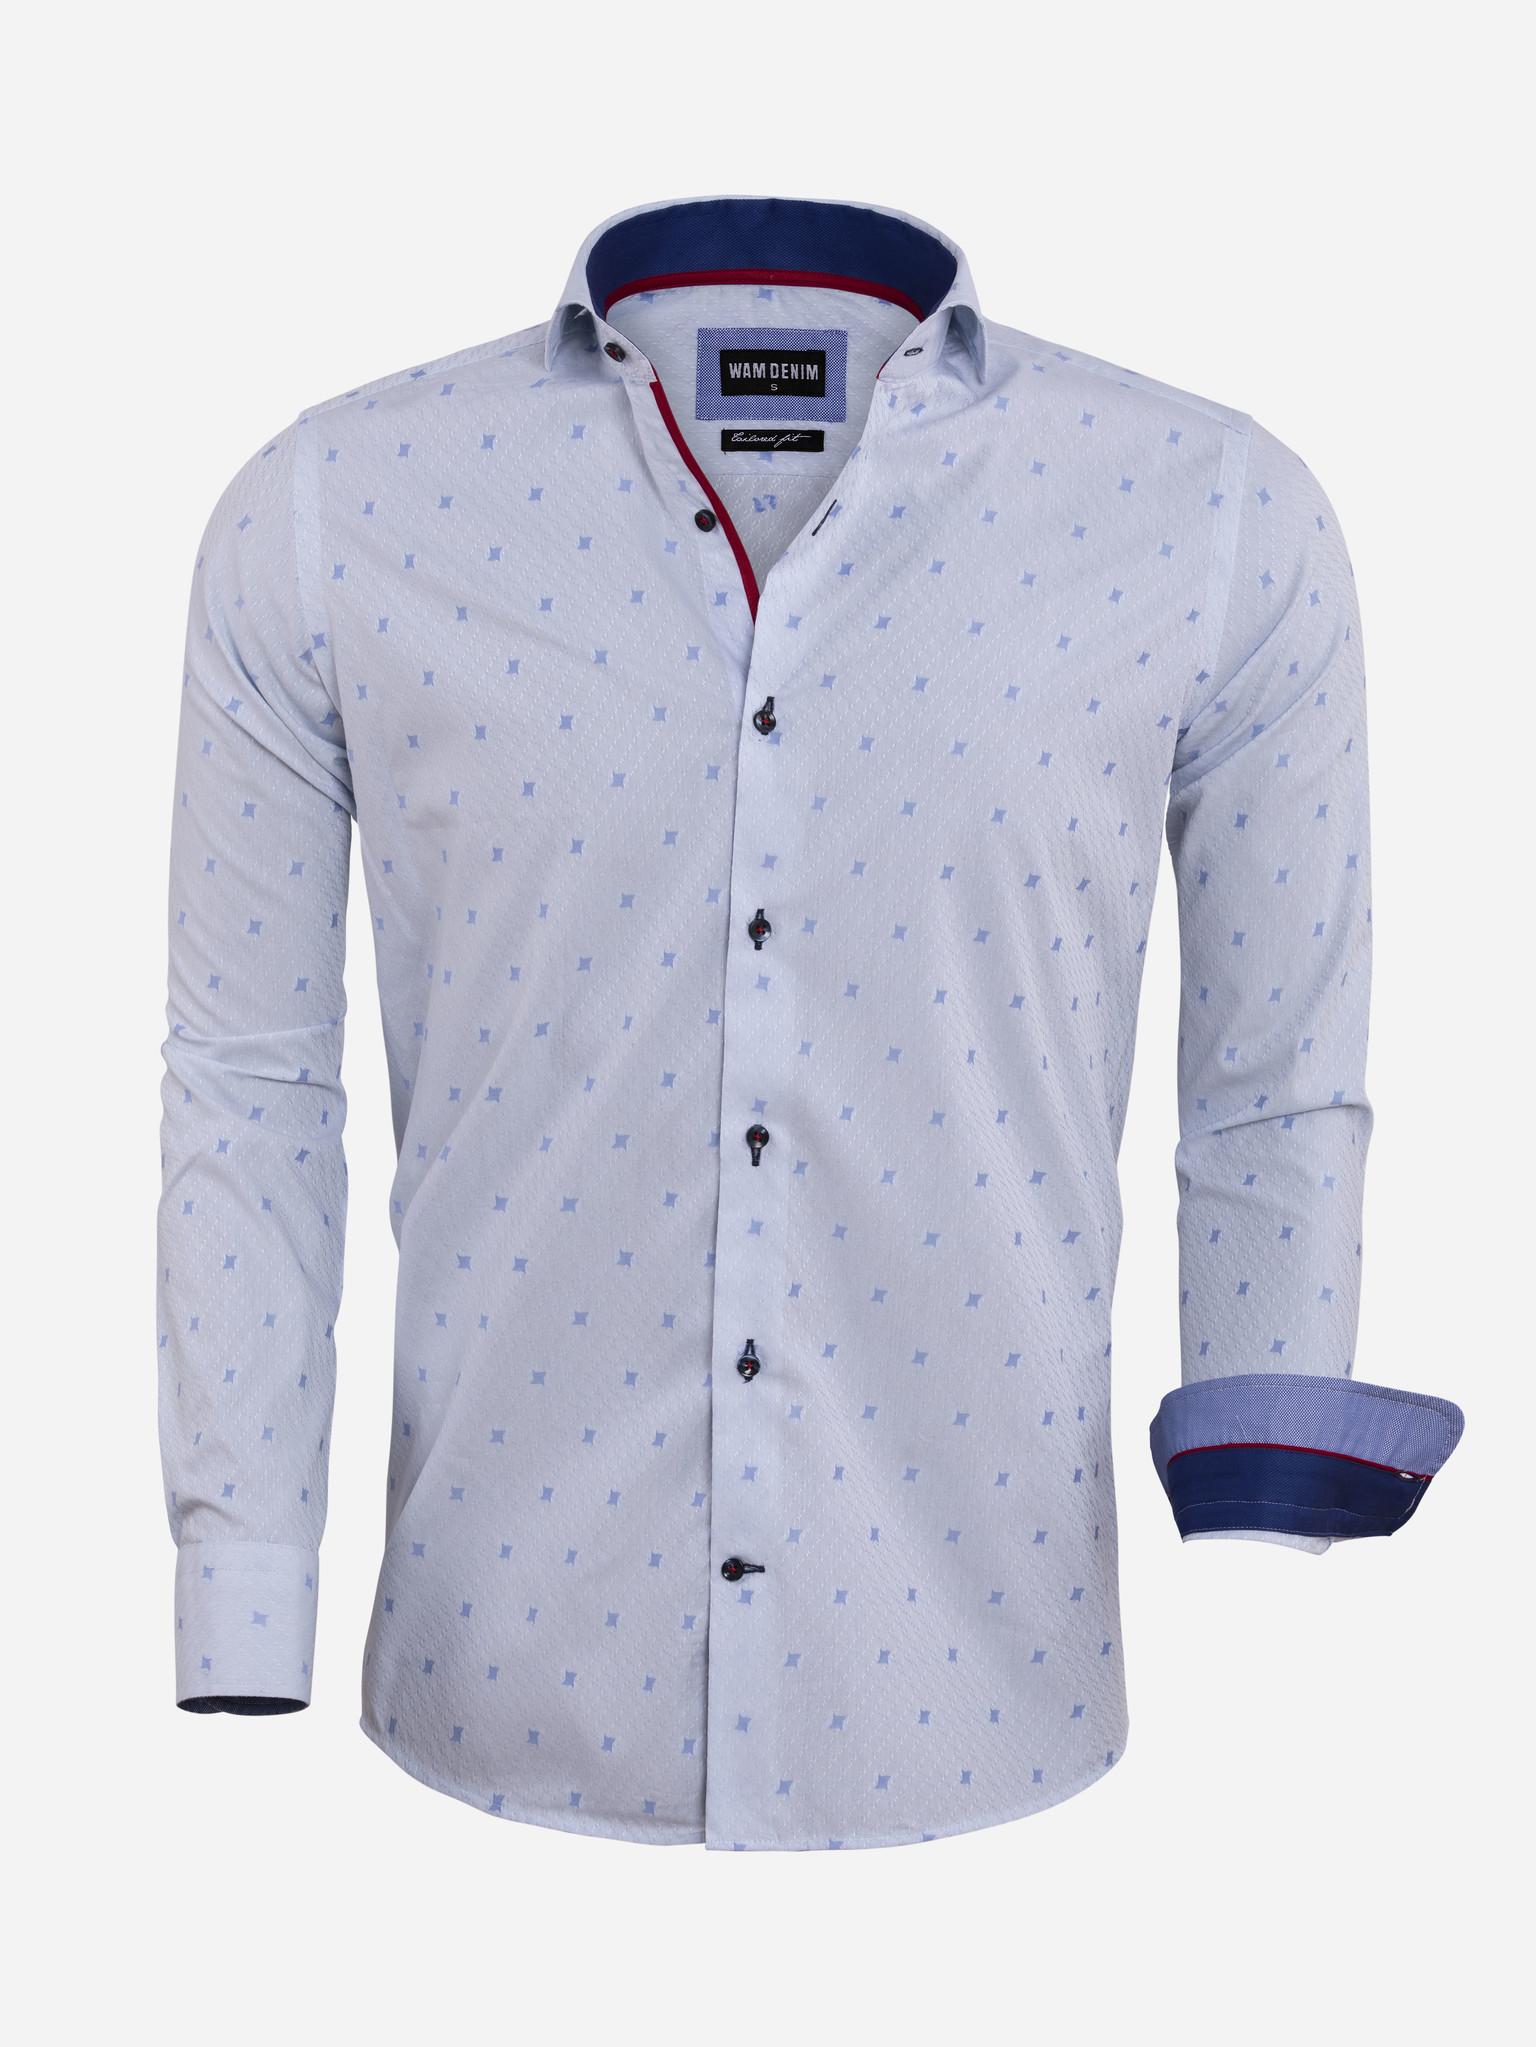 Wam Denim Overhemd Lange Mouw  Maat: 4XL